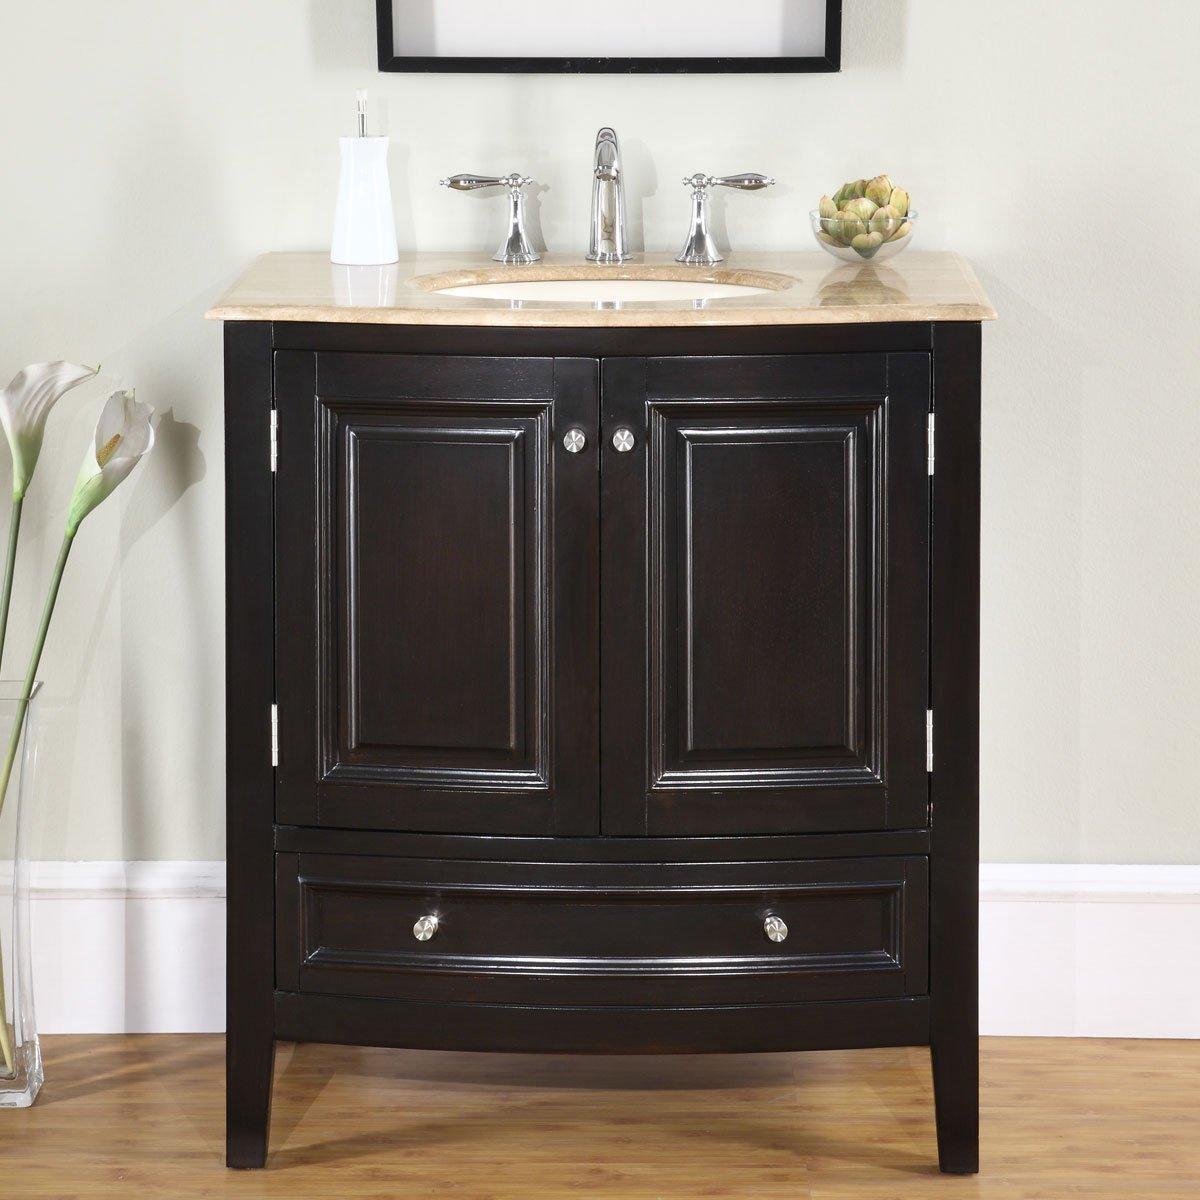 amazoncom silkroad exclusive travertine stone top single sink bathroom vanity with furniture cabinet 32inch home u0026 kitchen